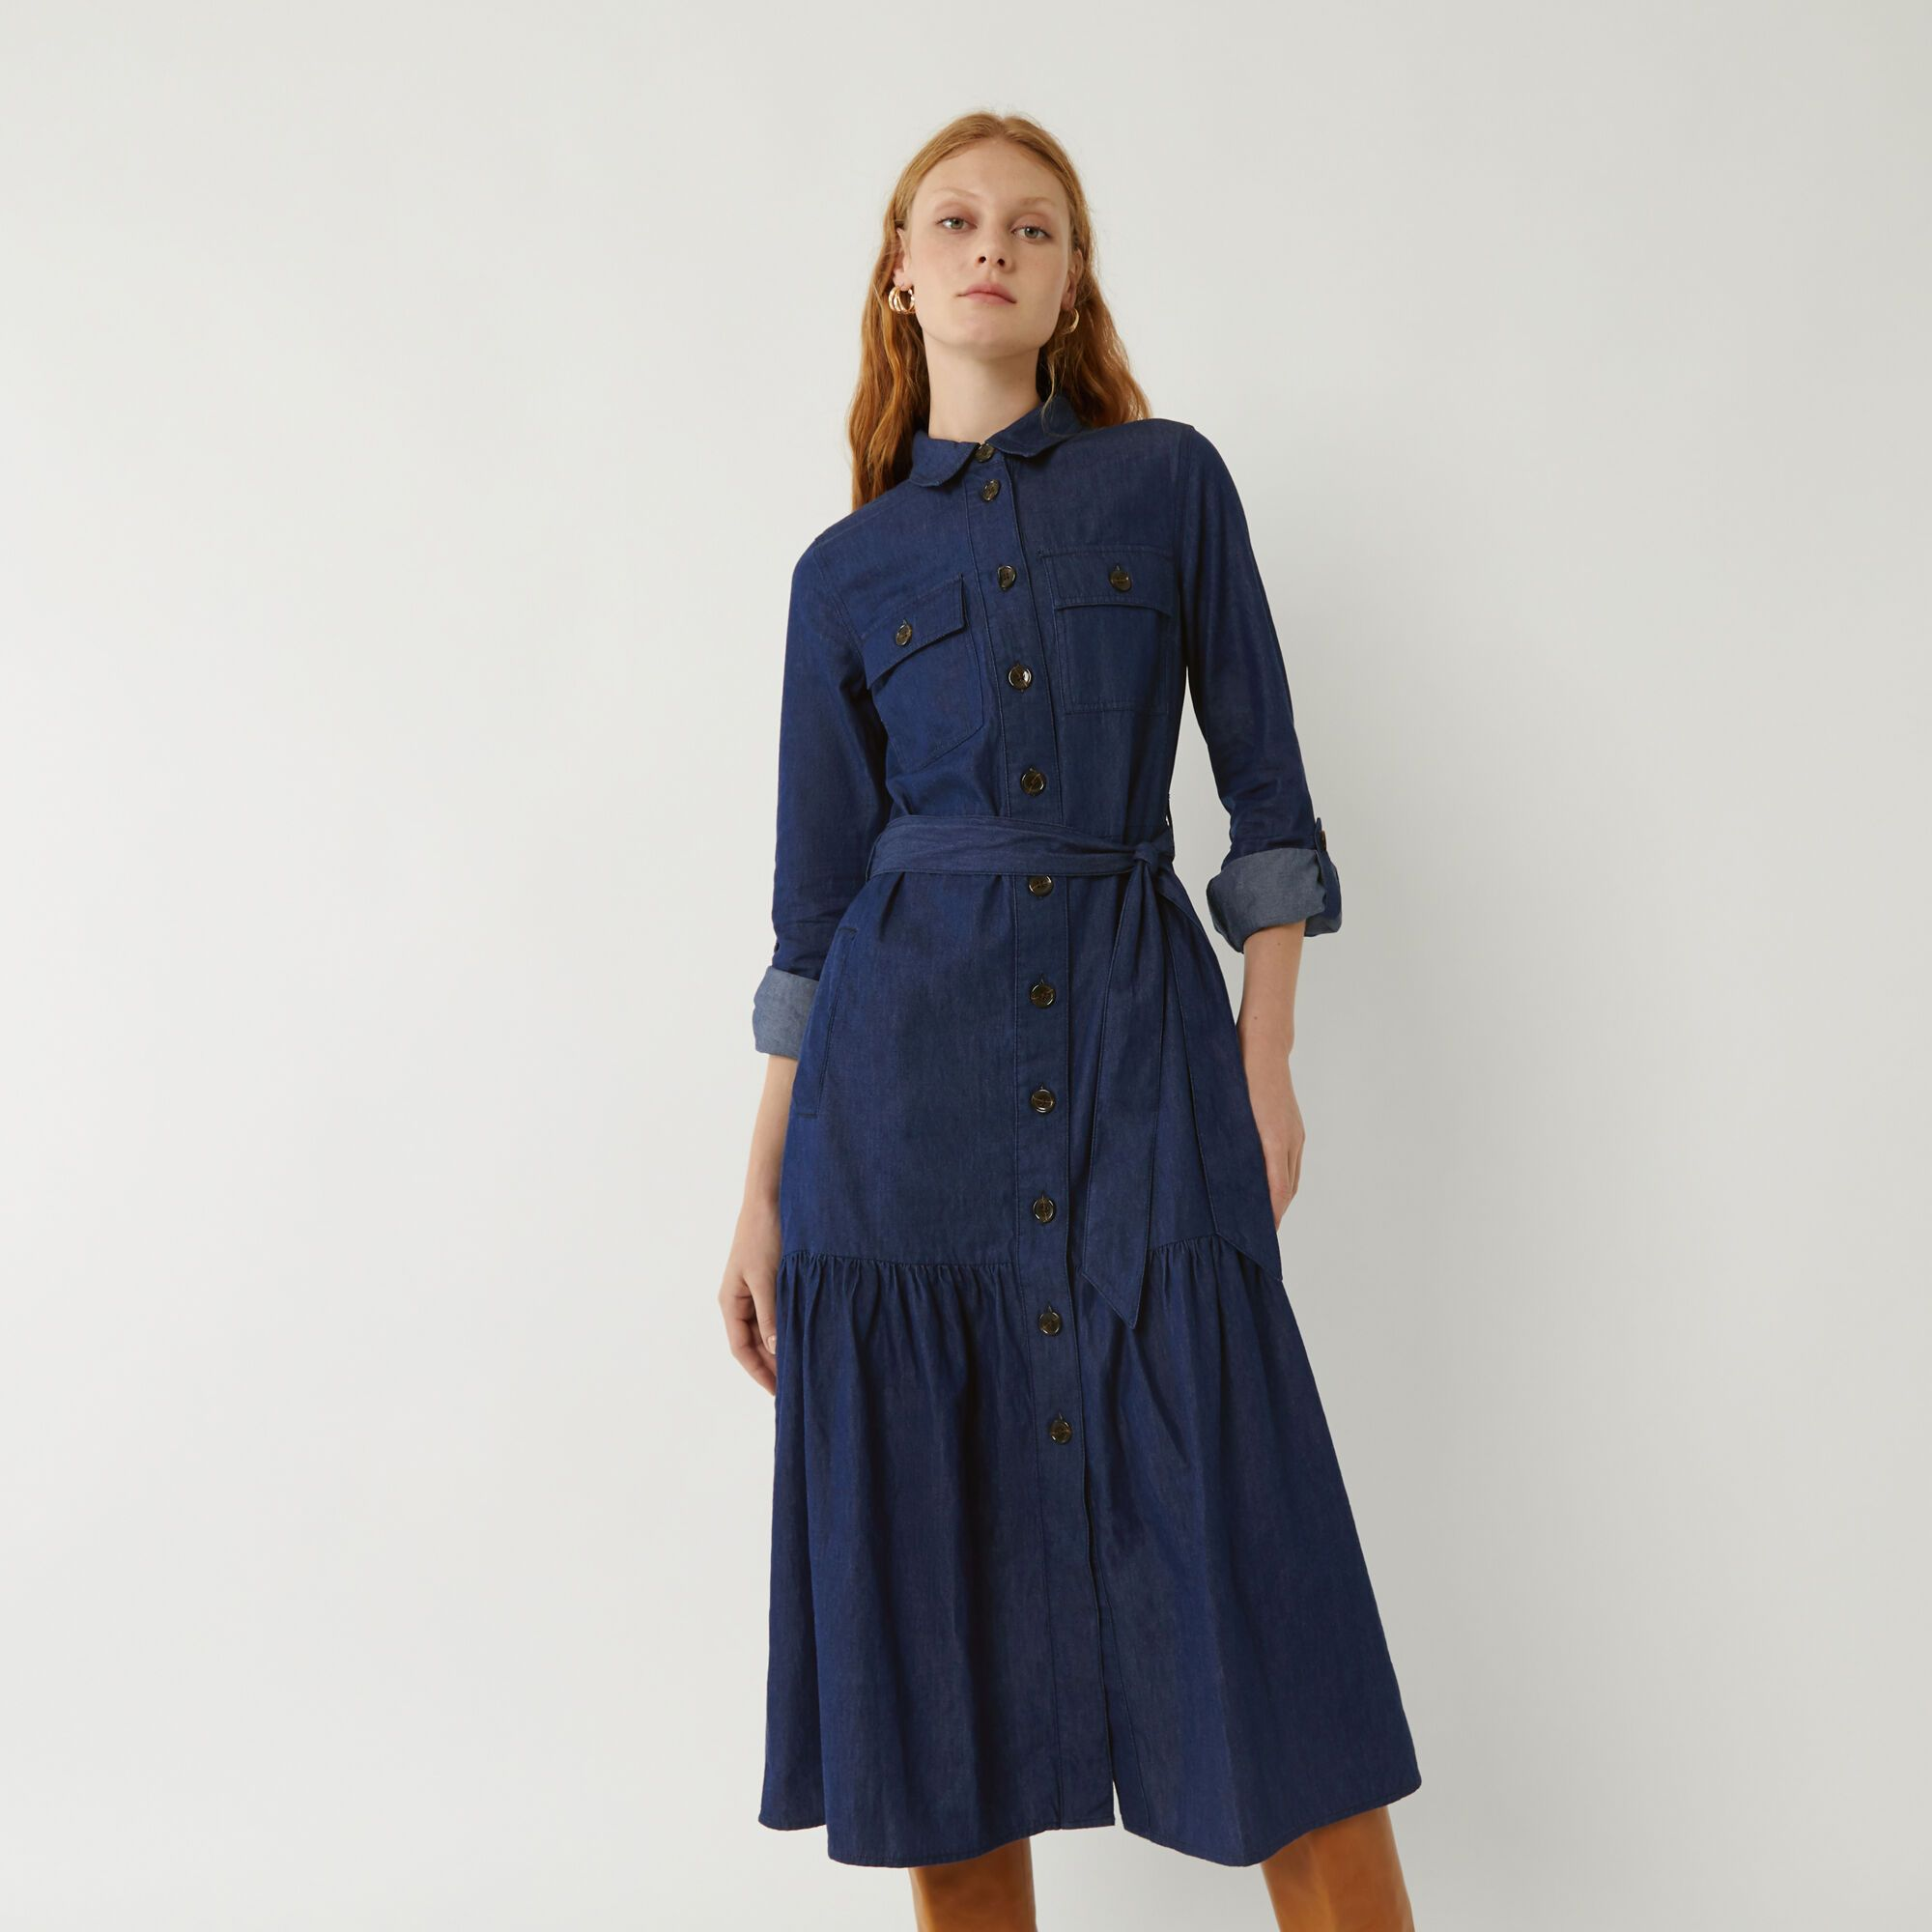 Fans lover Boden's versatile Abigail Jersey Dress